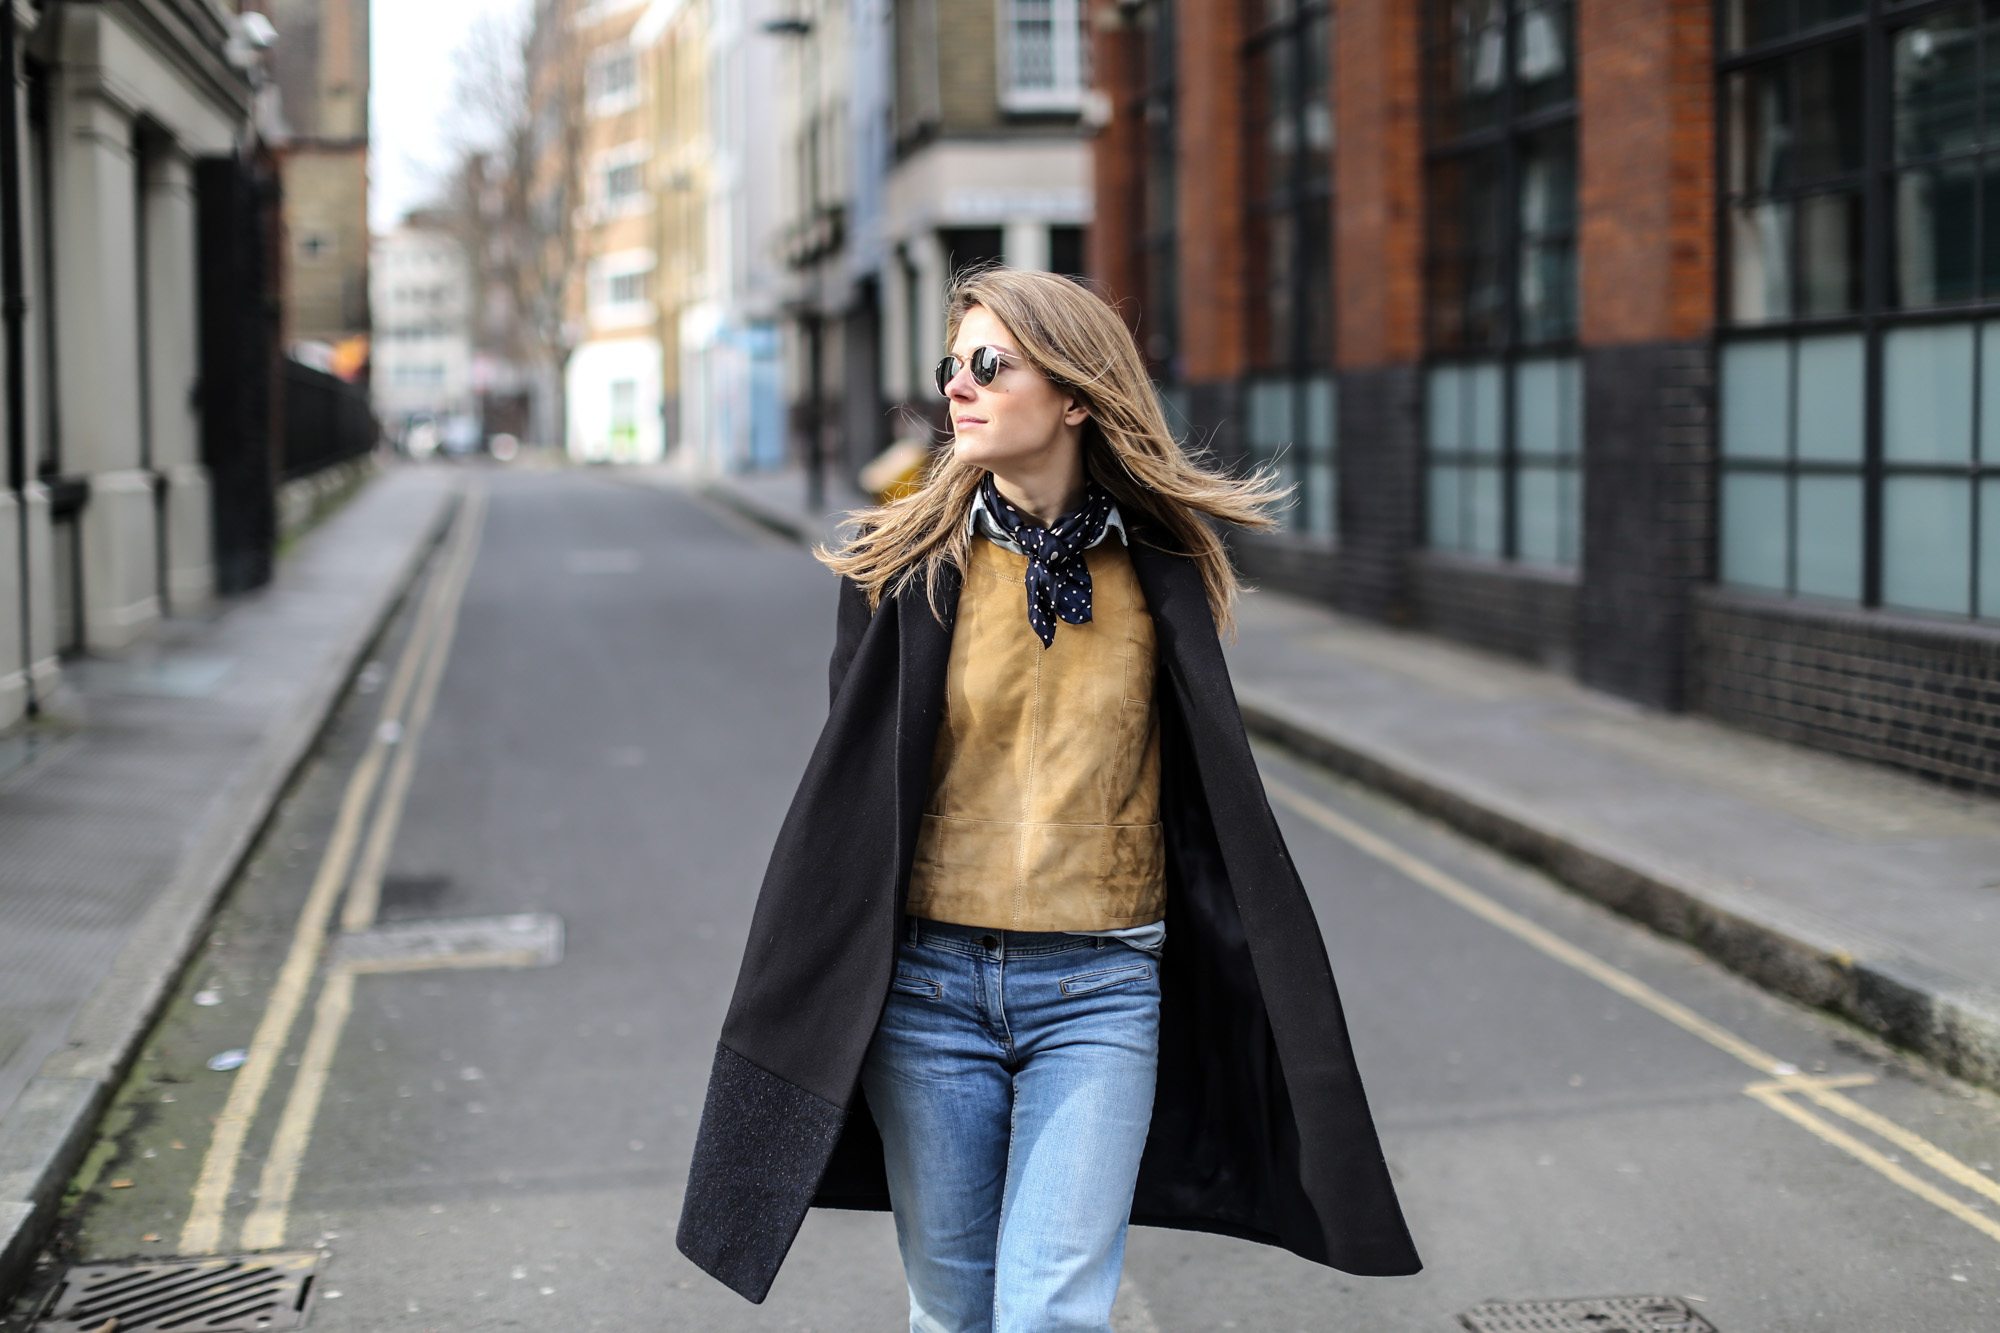 Clochet-wide-retro-jeans-suede-top-cos-coat-9